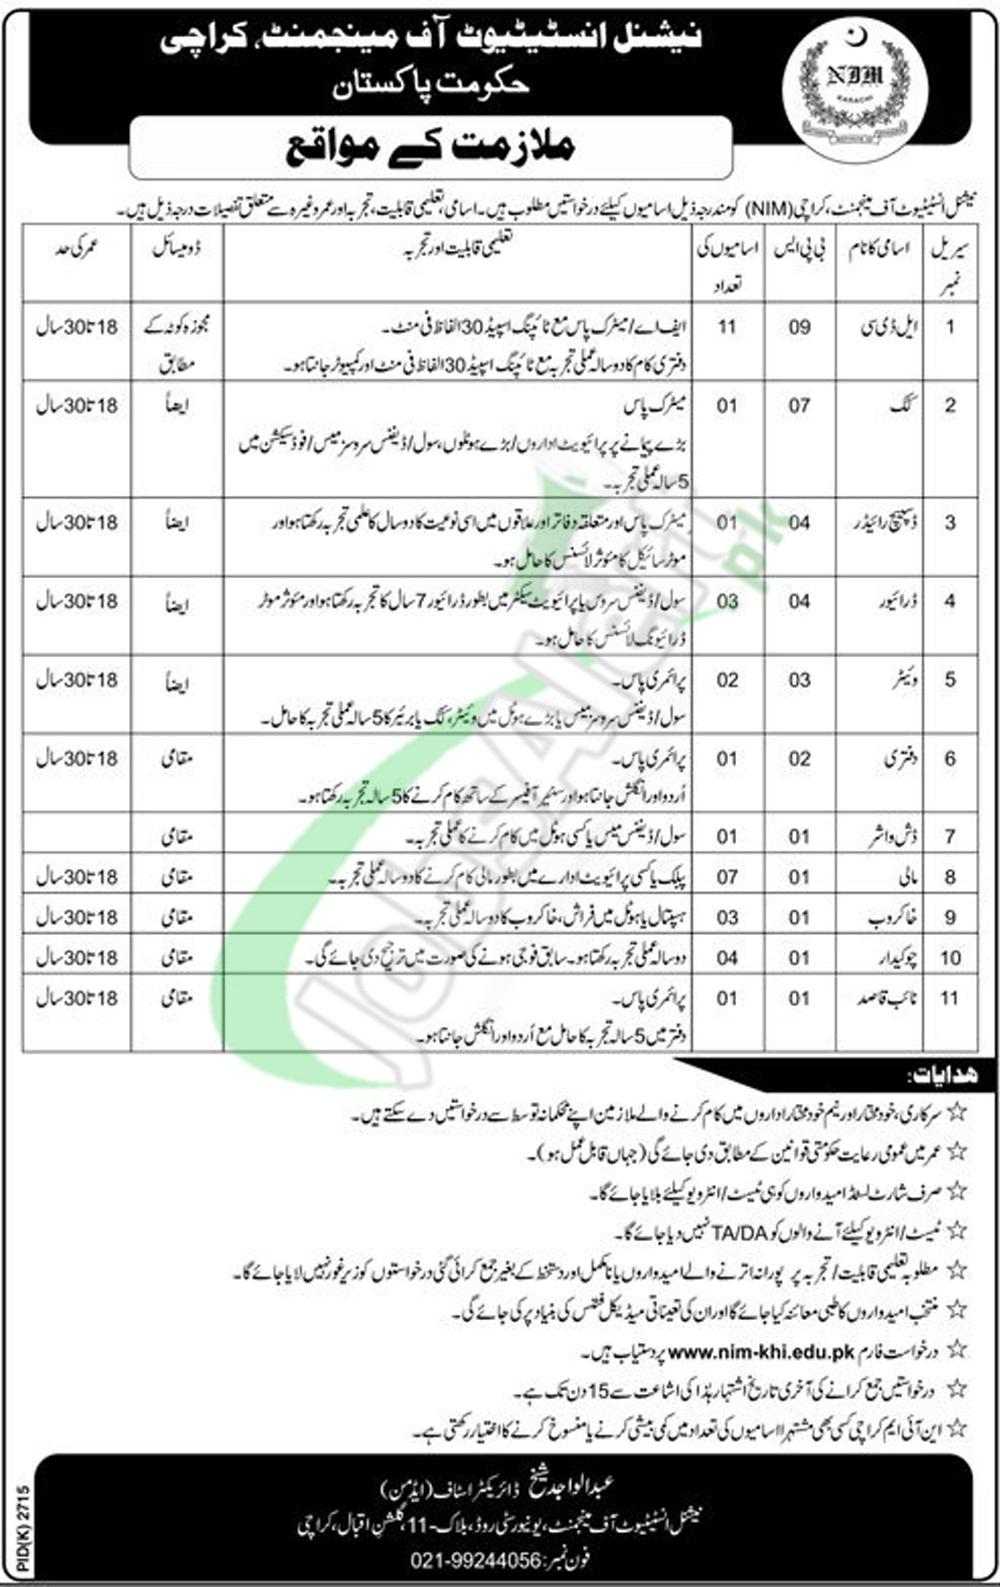 Government Jobs in Karachi 2018